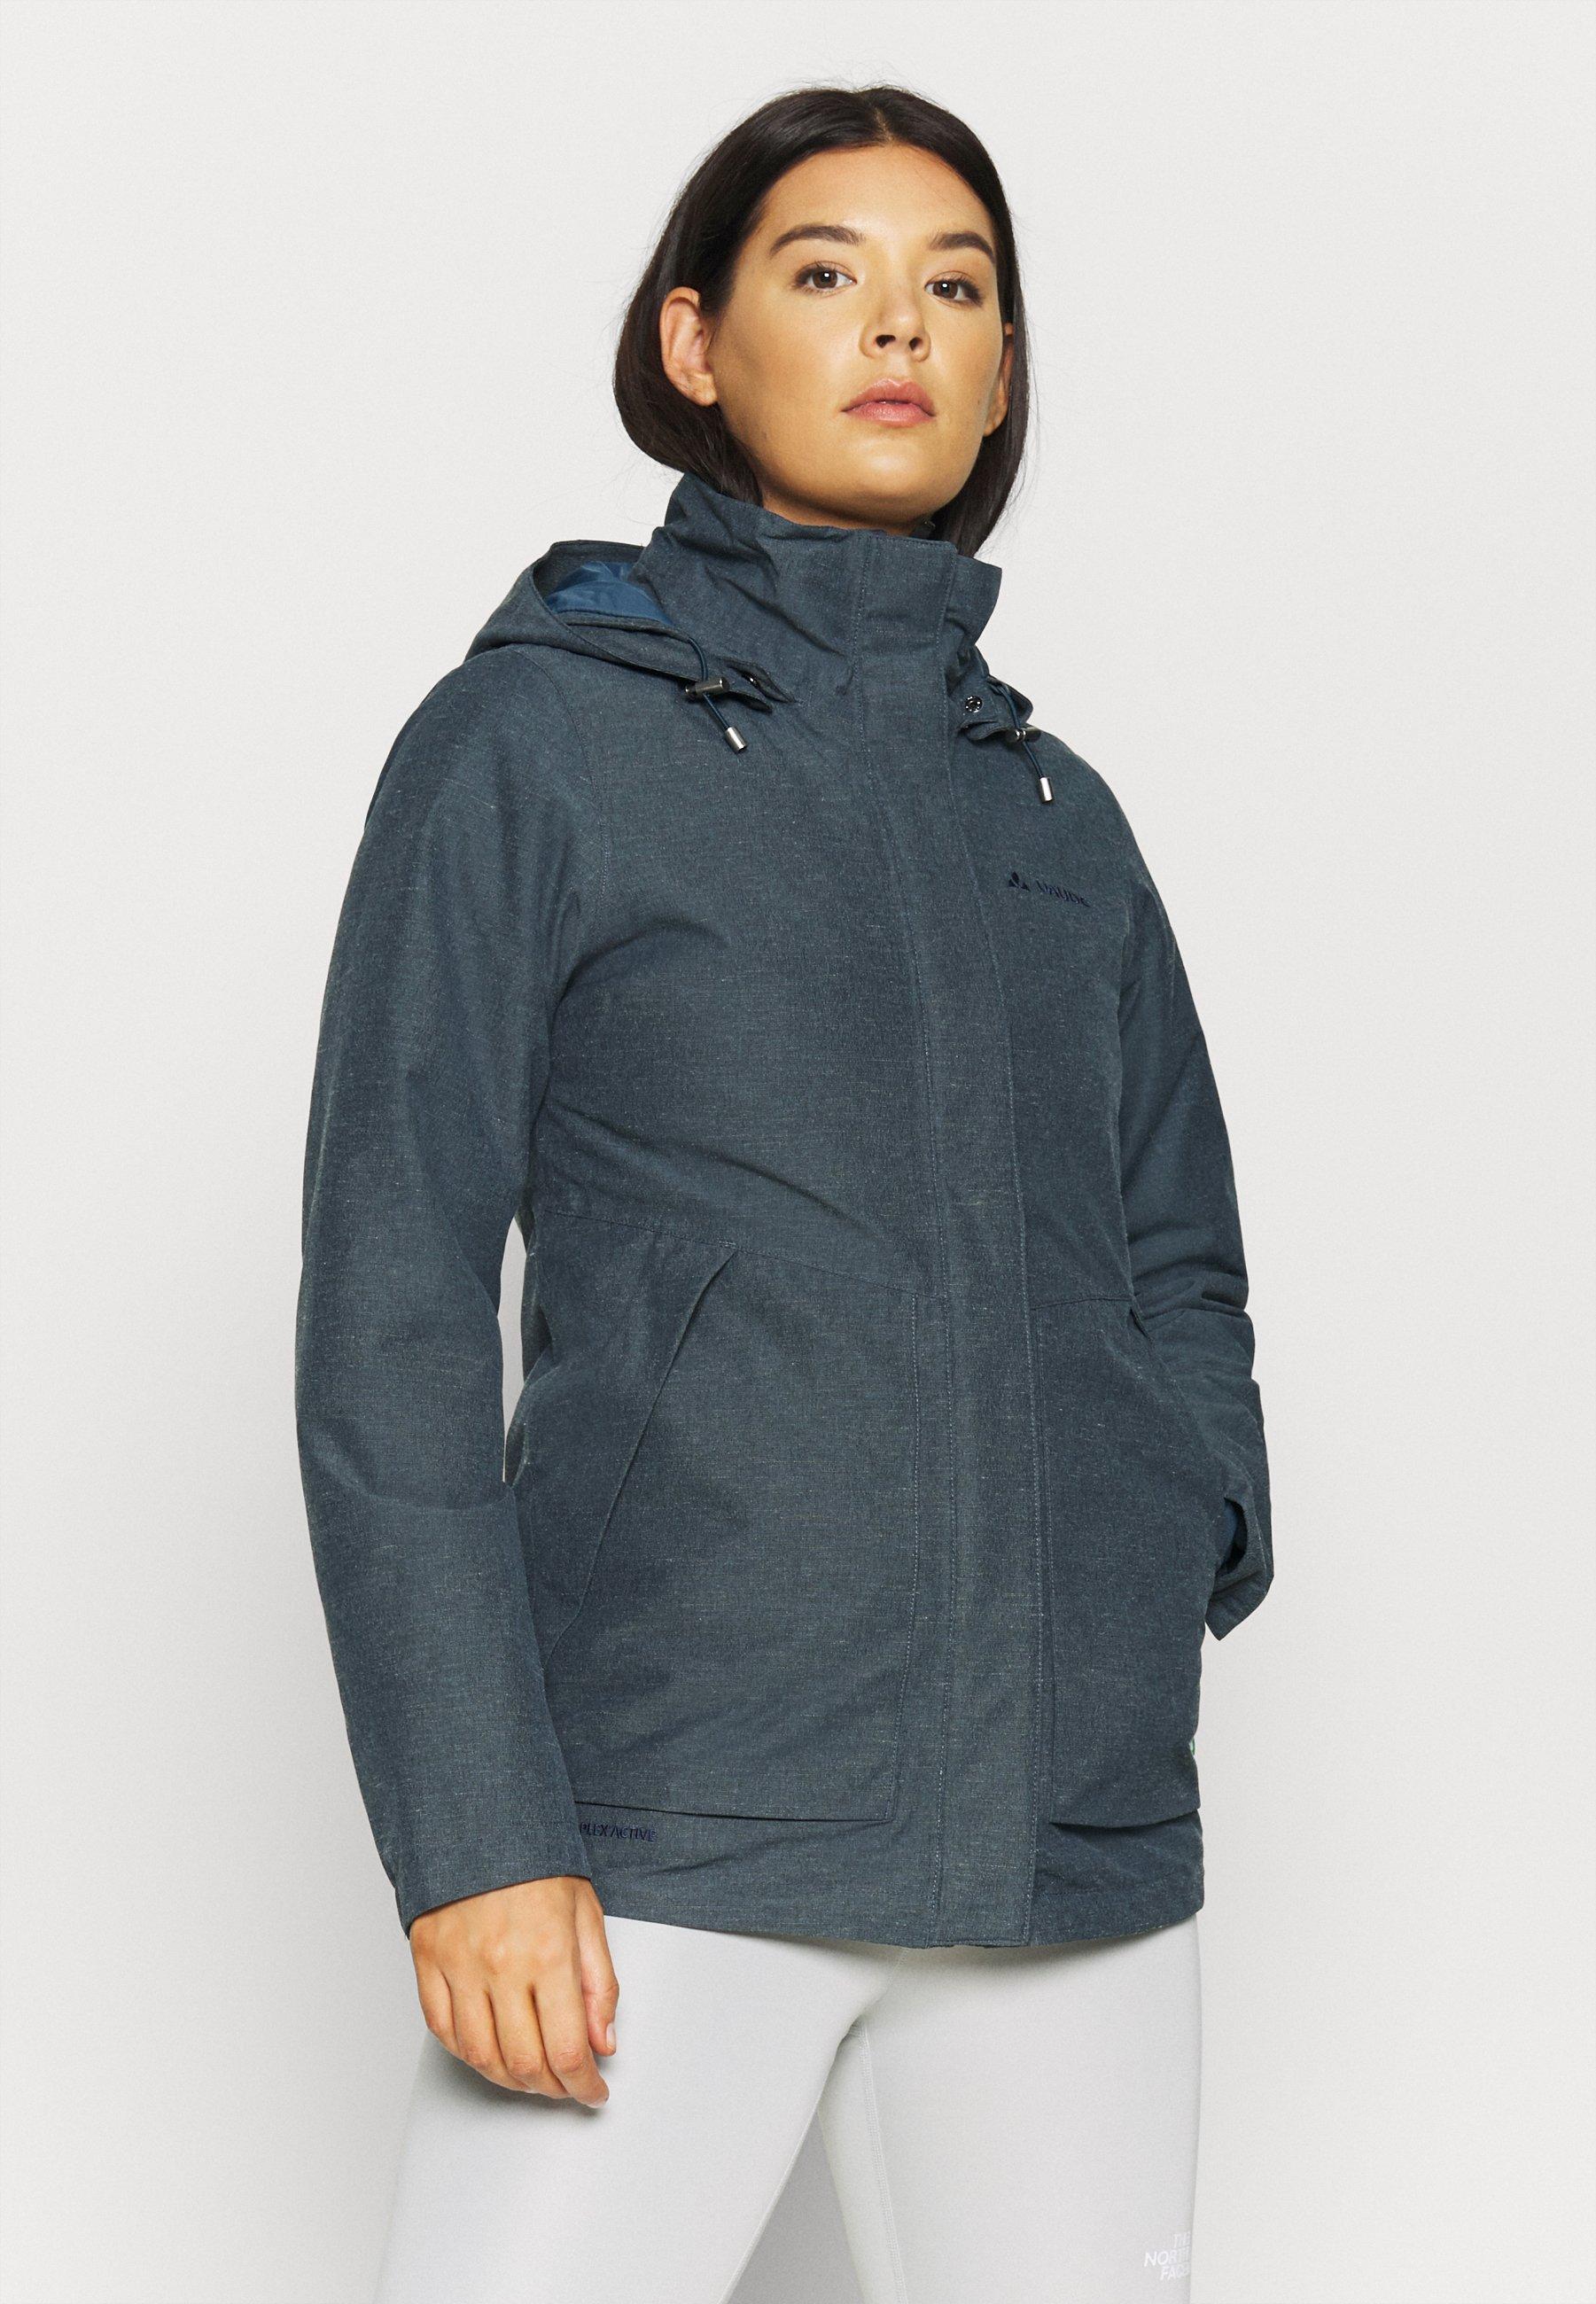 Vaude Wo Limford Jacket II gefütterte Damen-Jacke Kapuze abnehmbar Gr.40//M NEU